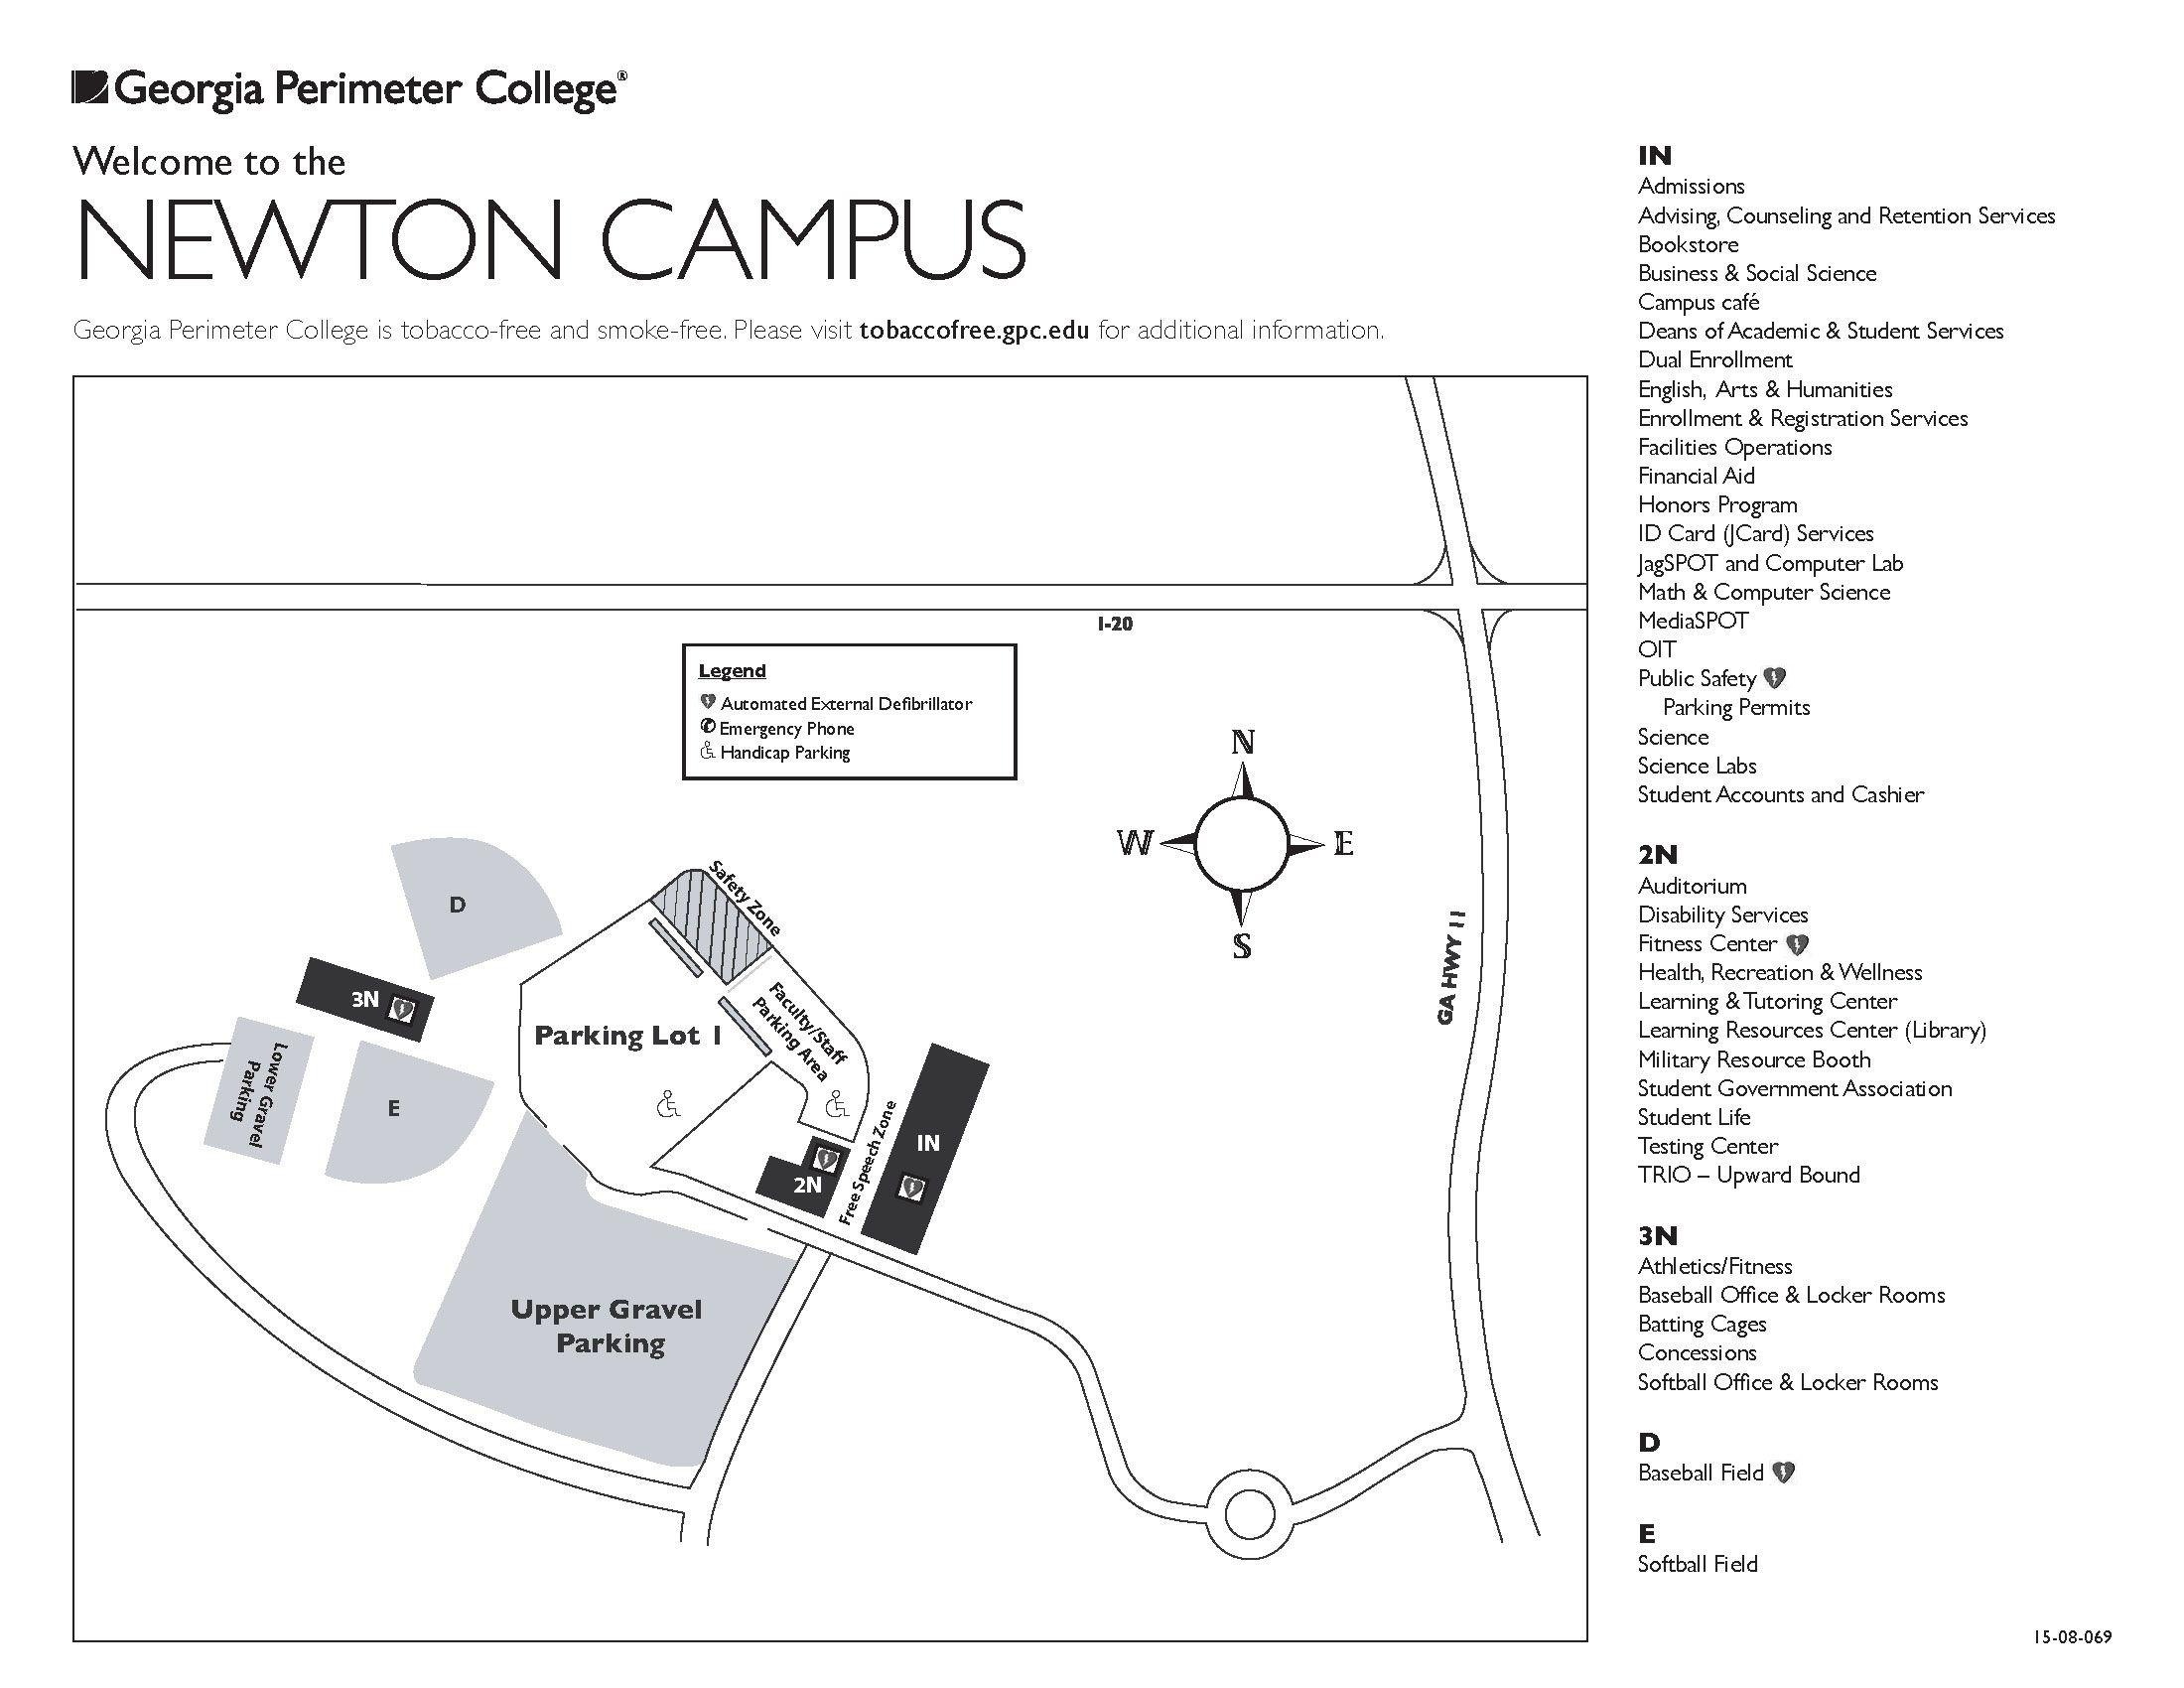 Newton Campus Map   Campus Maps   Campus map, Map, College ... on ucla address, ucla map and area, ucla california map, ucla school map, ucla housing, ucla seal, ucla map pdf, ucla parking lot map, ucla bruins, campbell hall ucla map, ucla direction map, ucla residence hall map, ucla logo, ucla tuition, westwood map, ucla pool, ucla mascot,